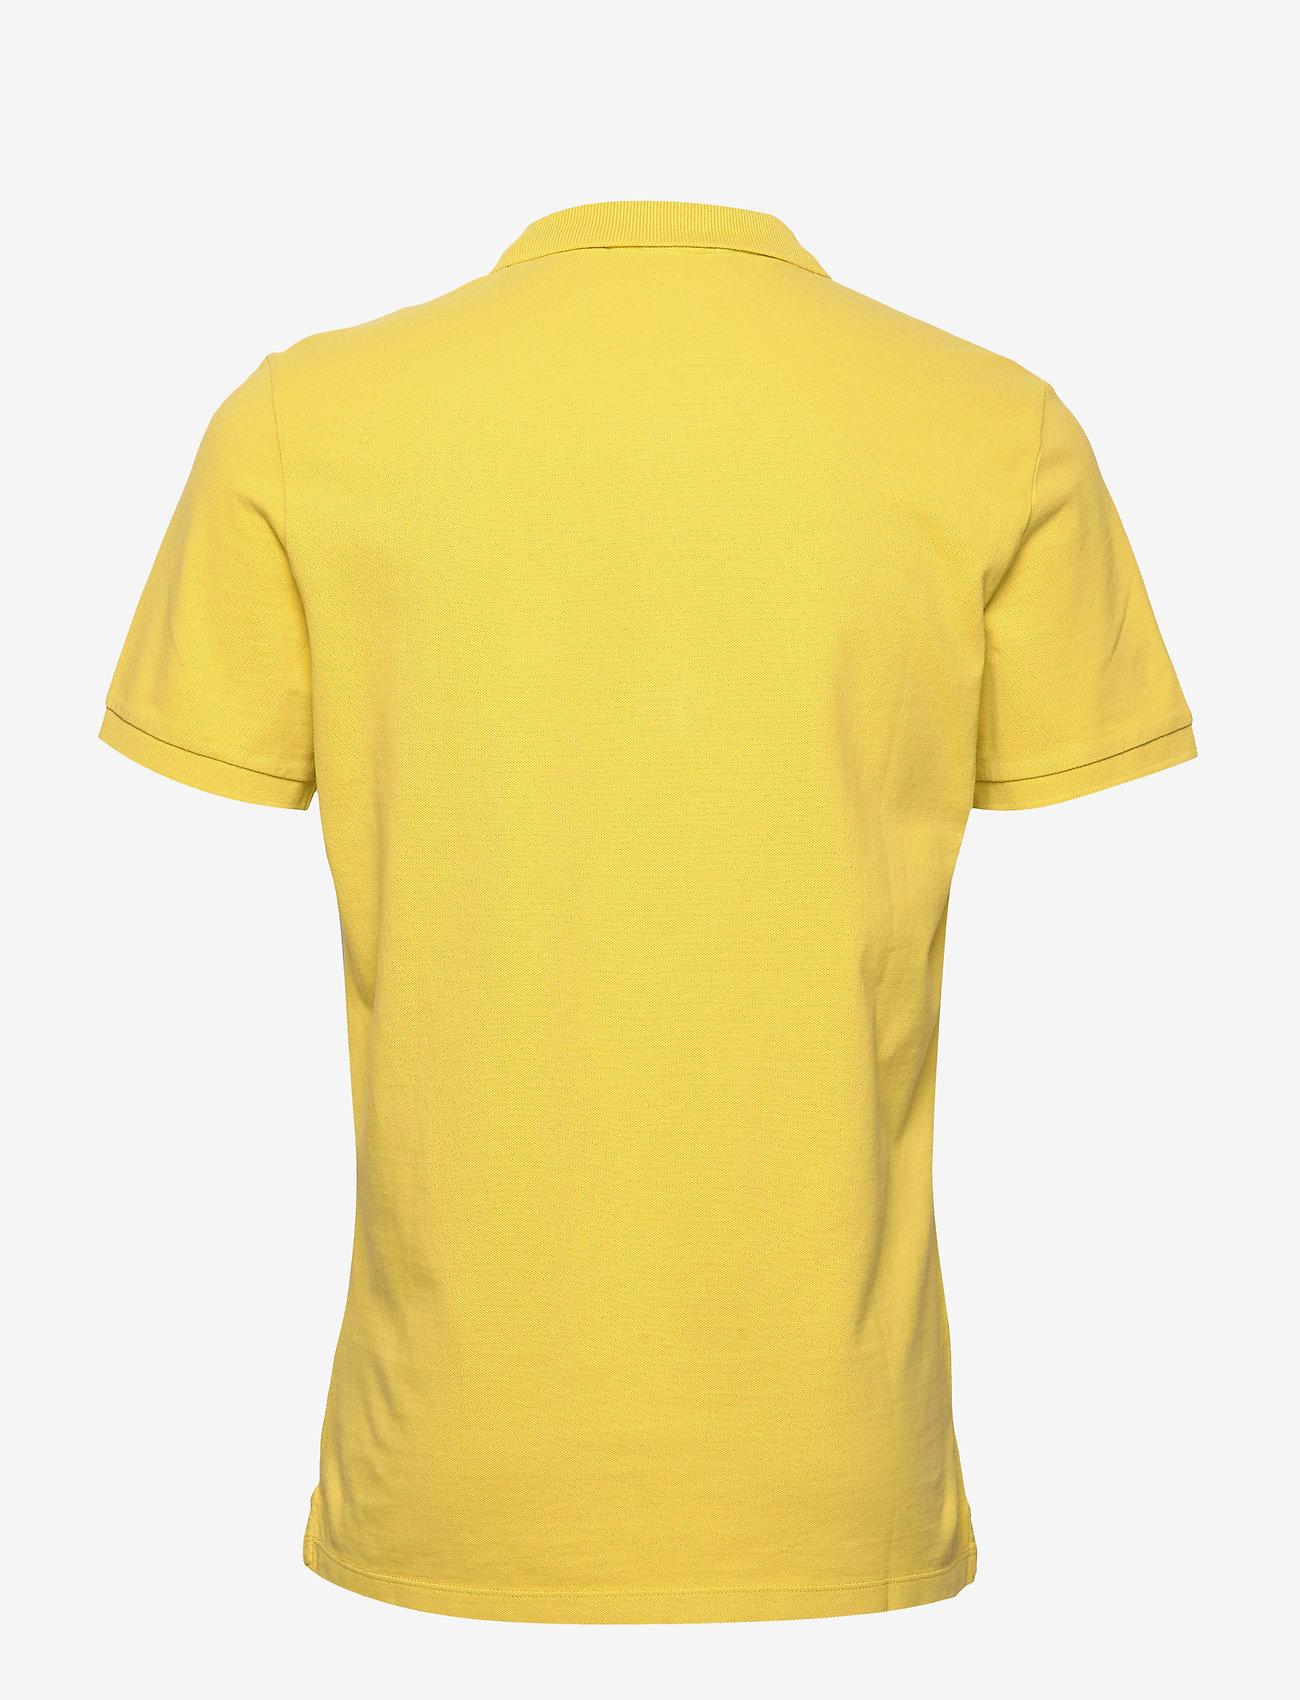 Casual Fridaypolo Cftanner - Poloshirts